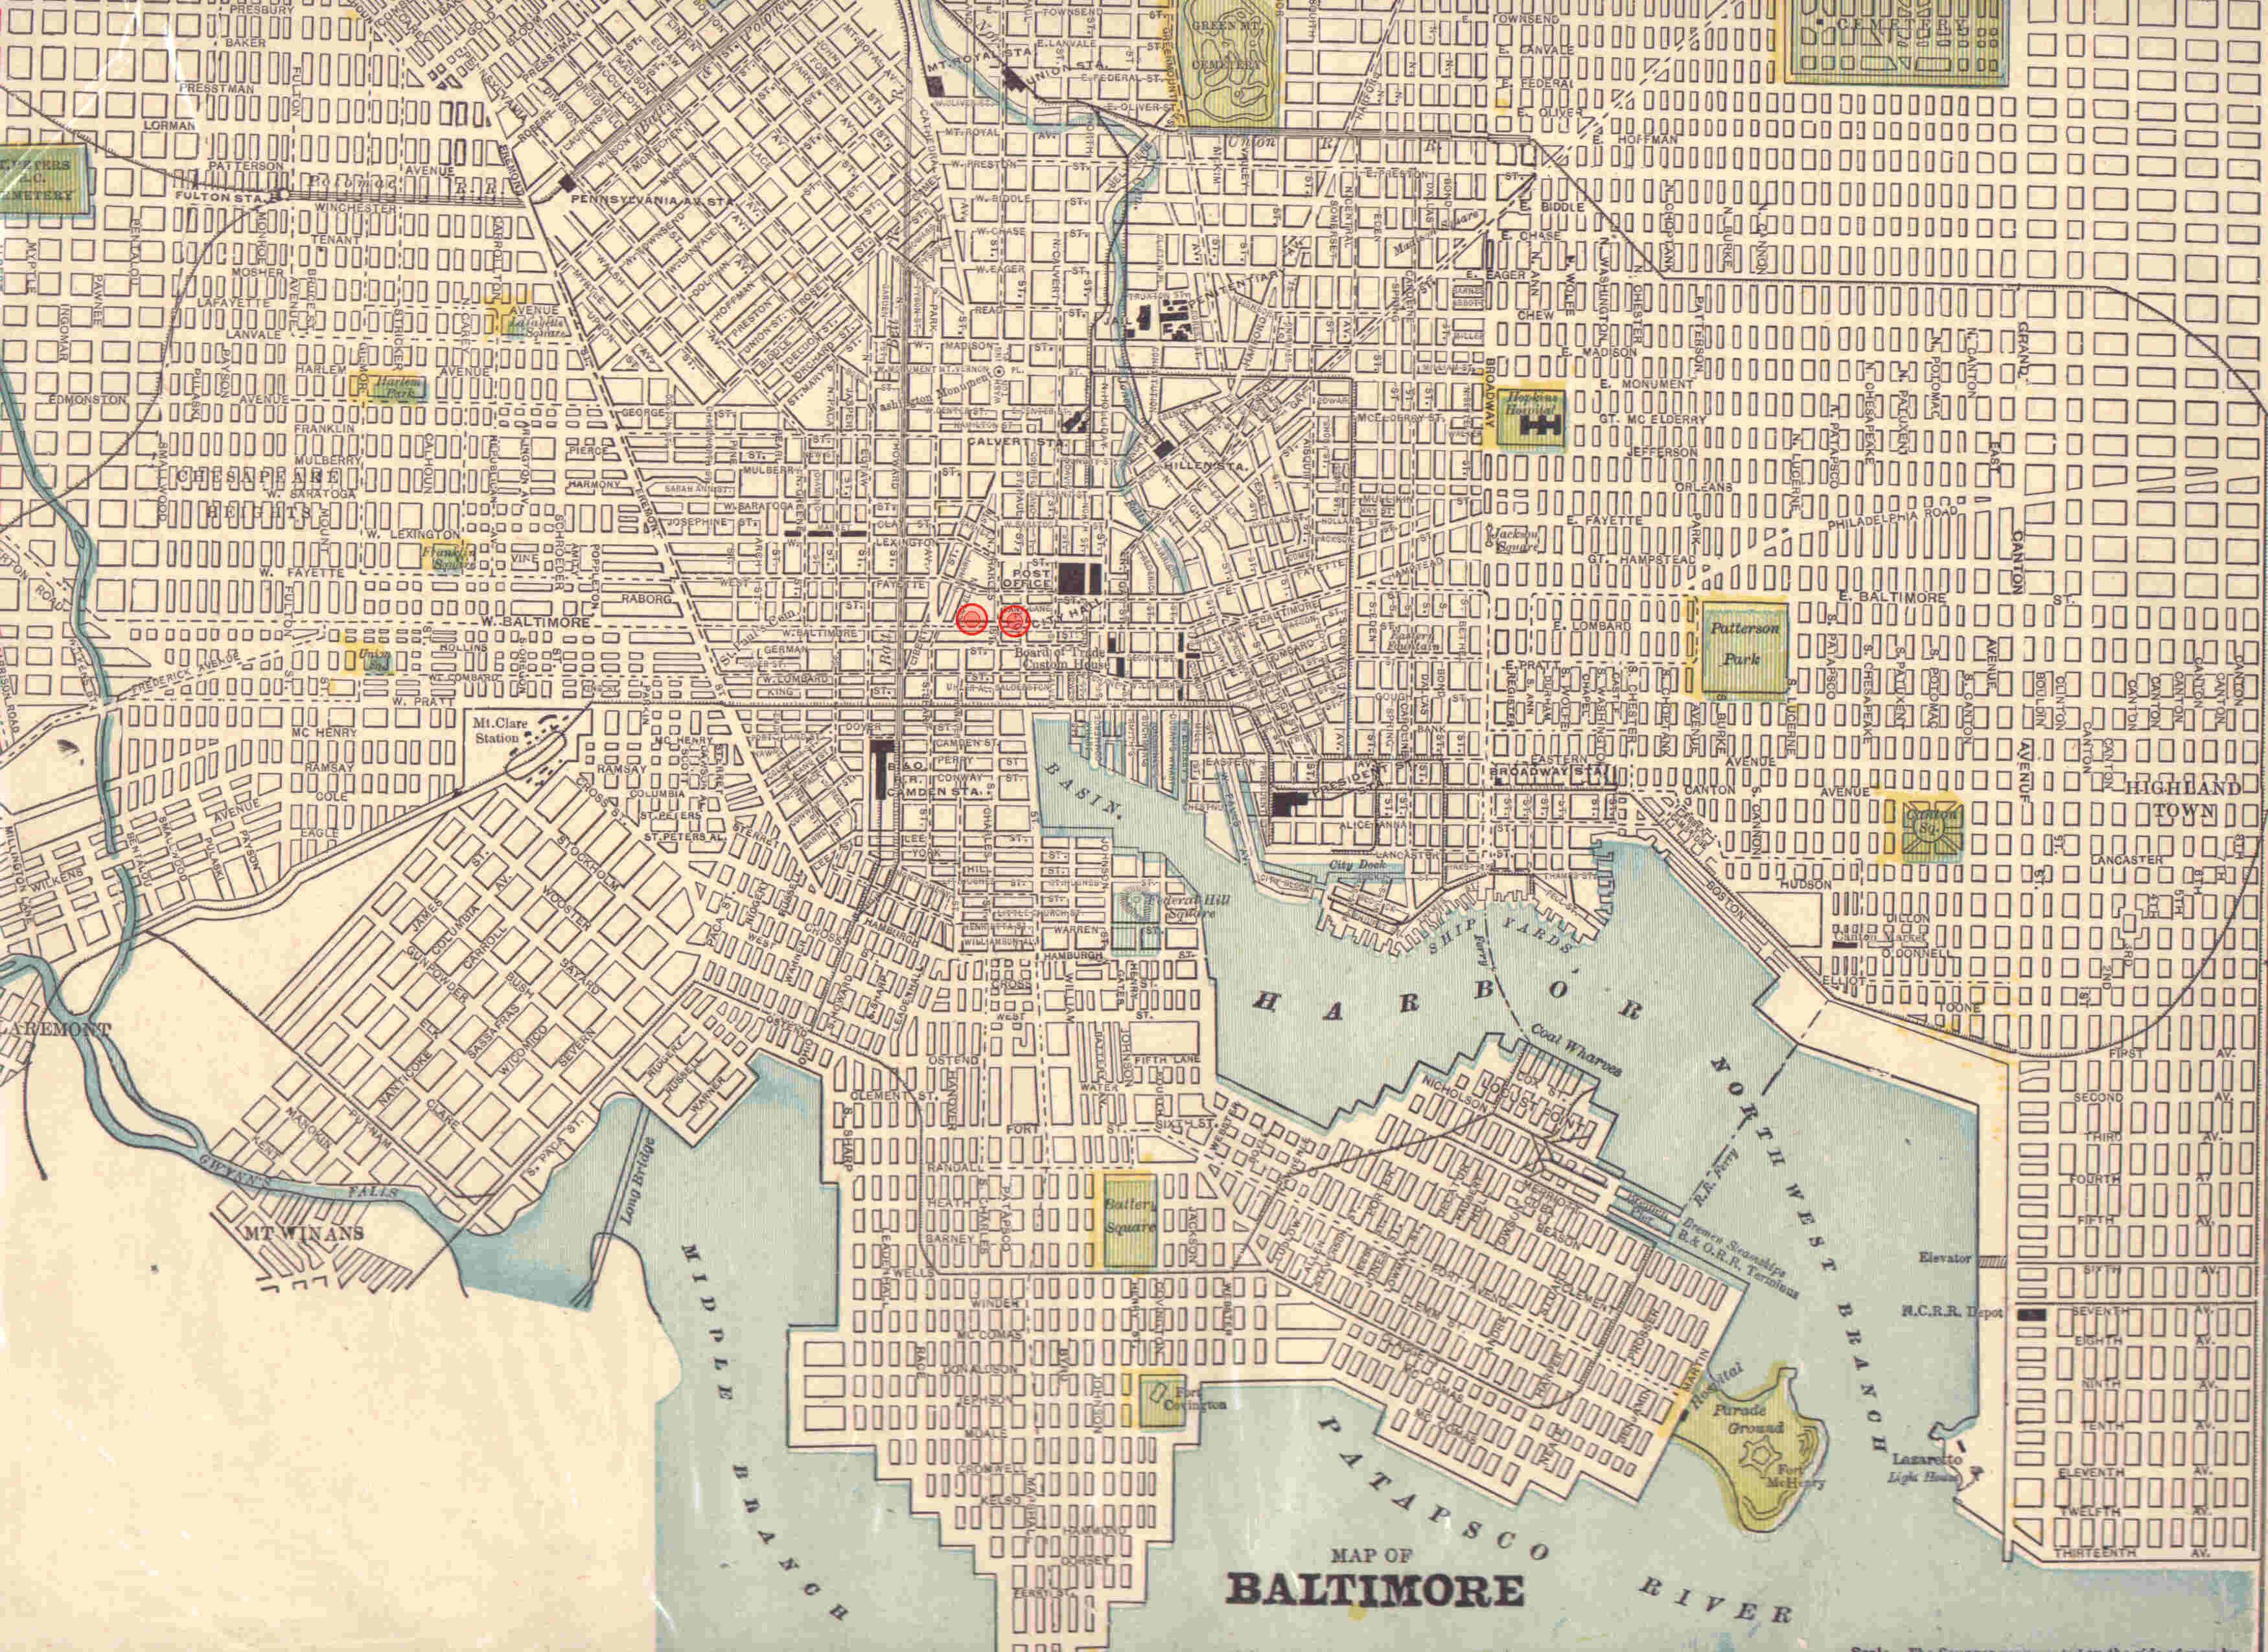 Baltimore City Map Page Genealogy RolkerDiering Pinterest